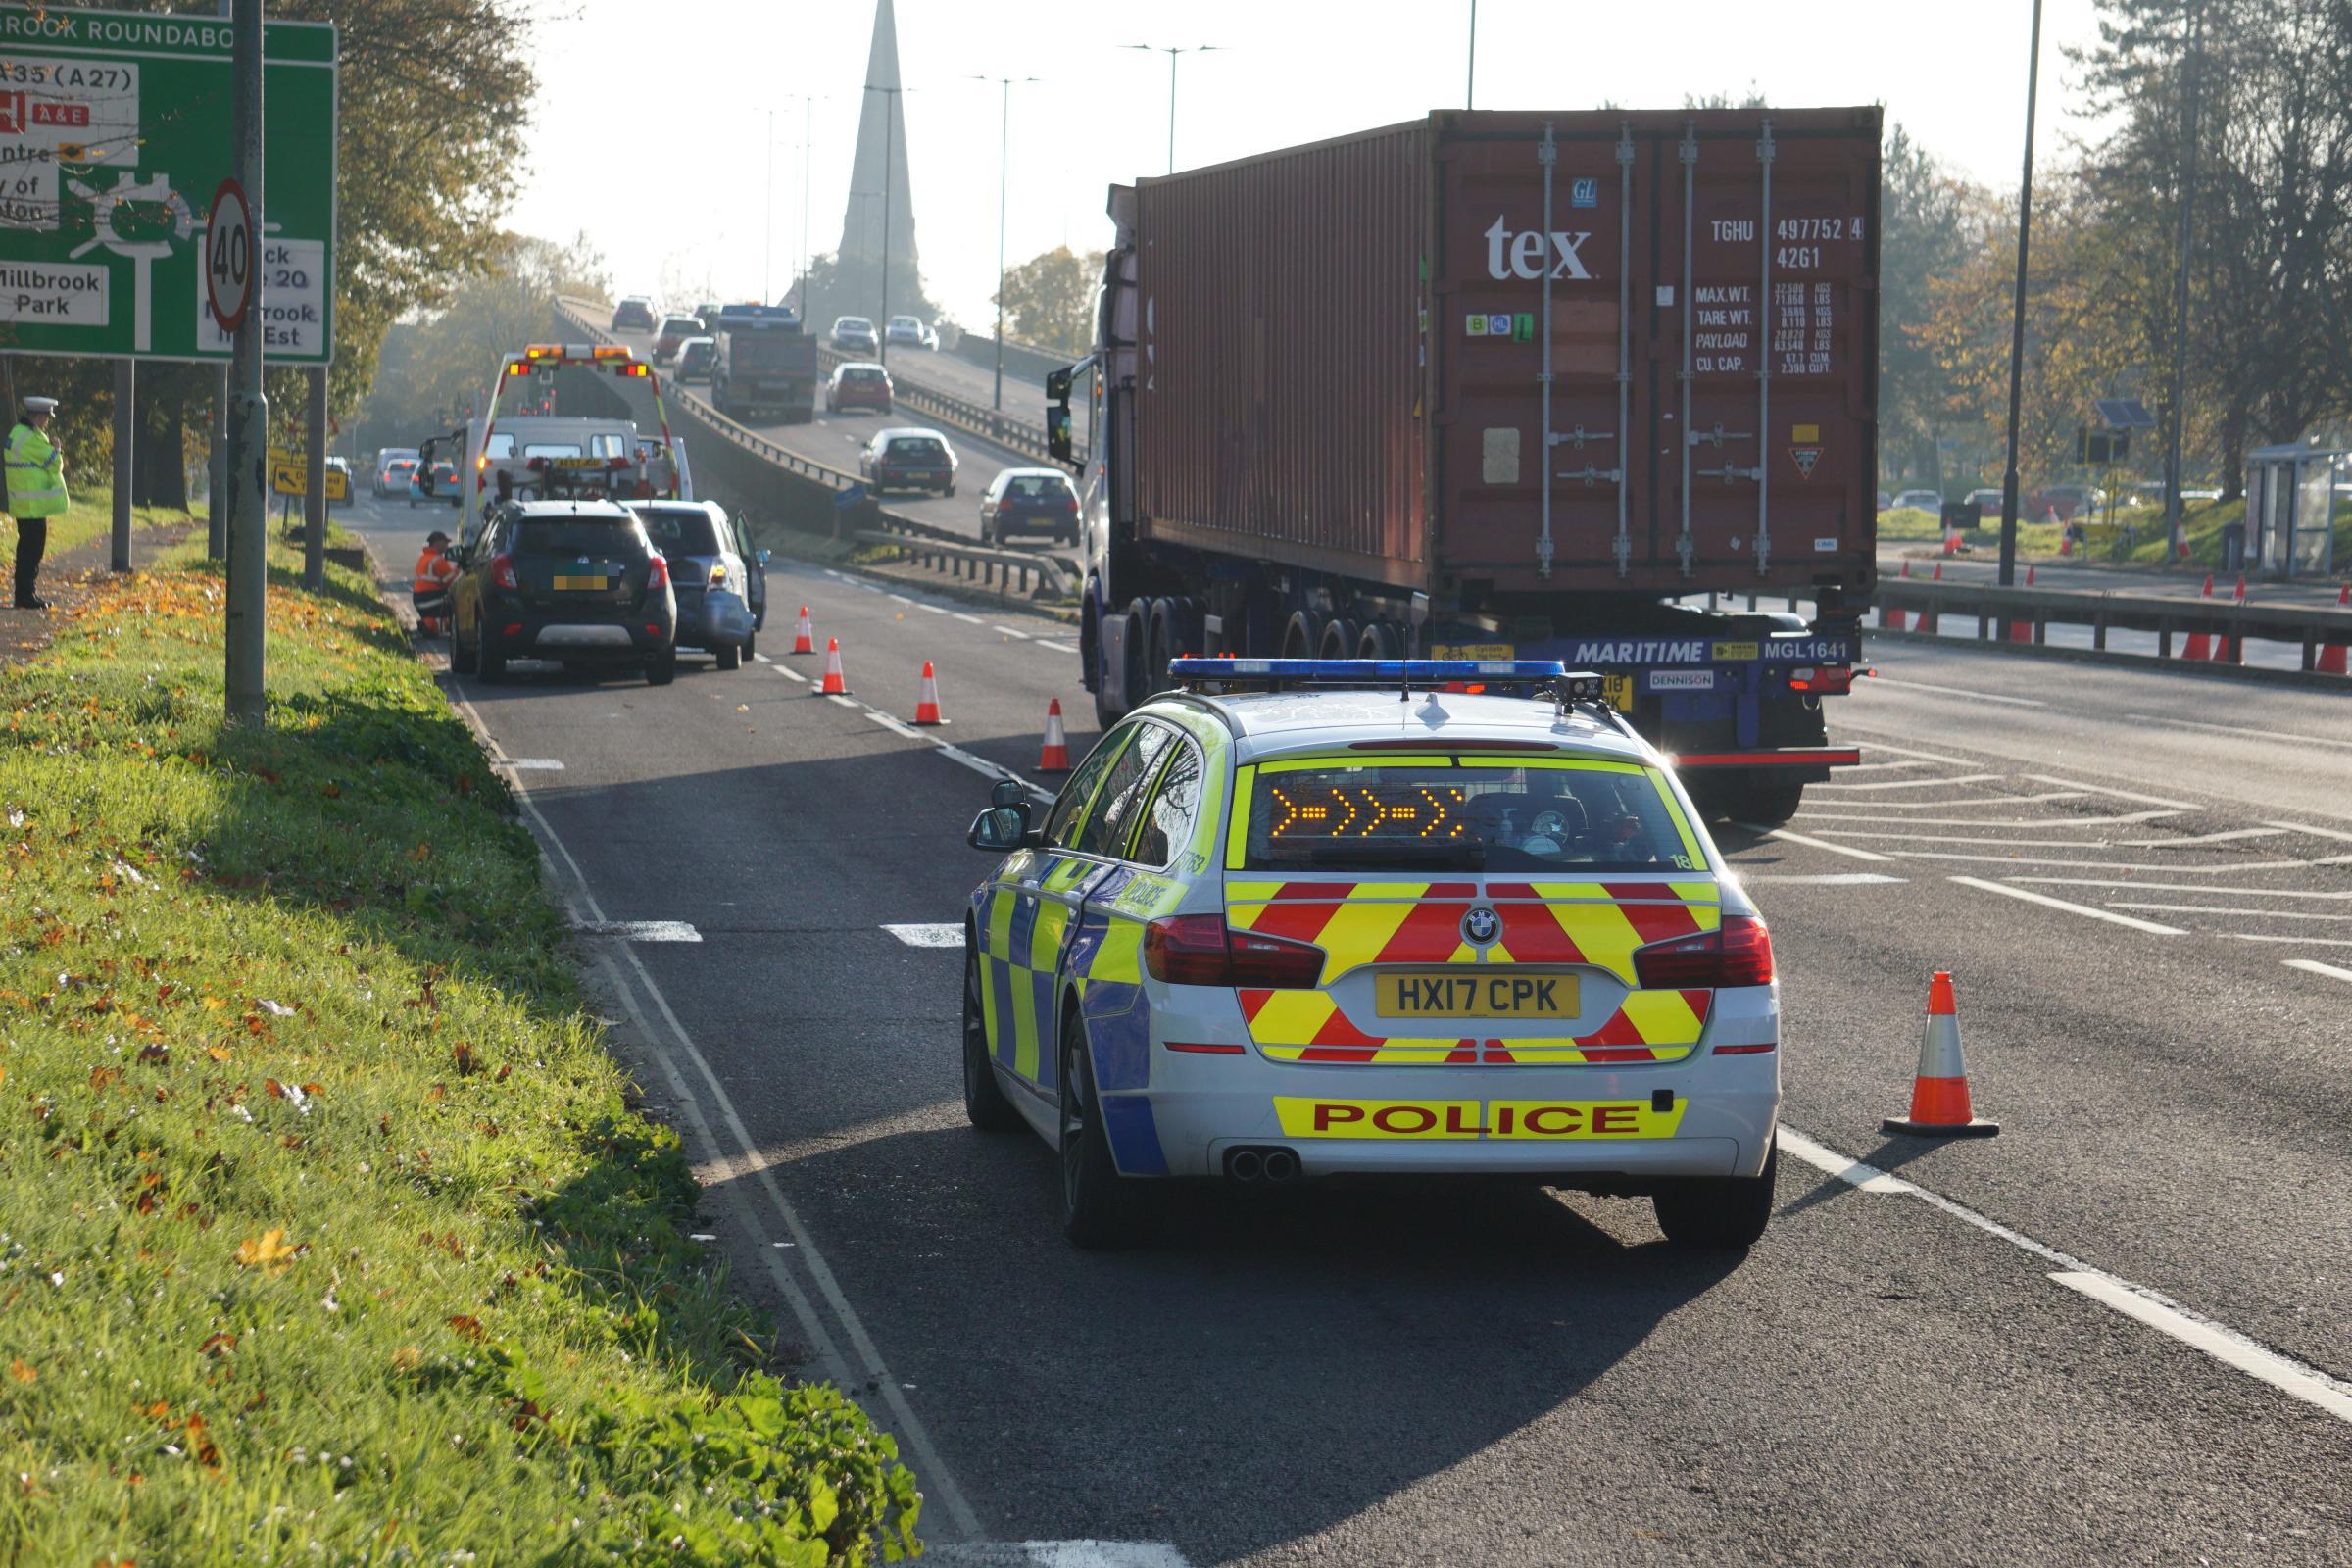 Two lanes of Redbridge Road blocked after crash - Daily Echo